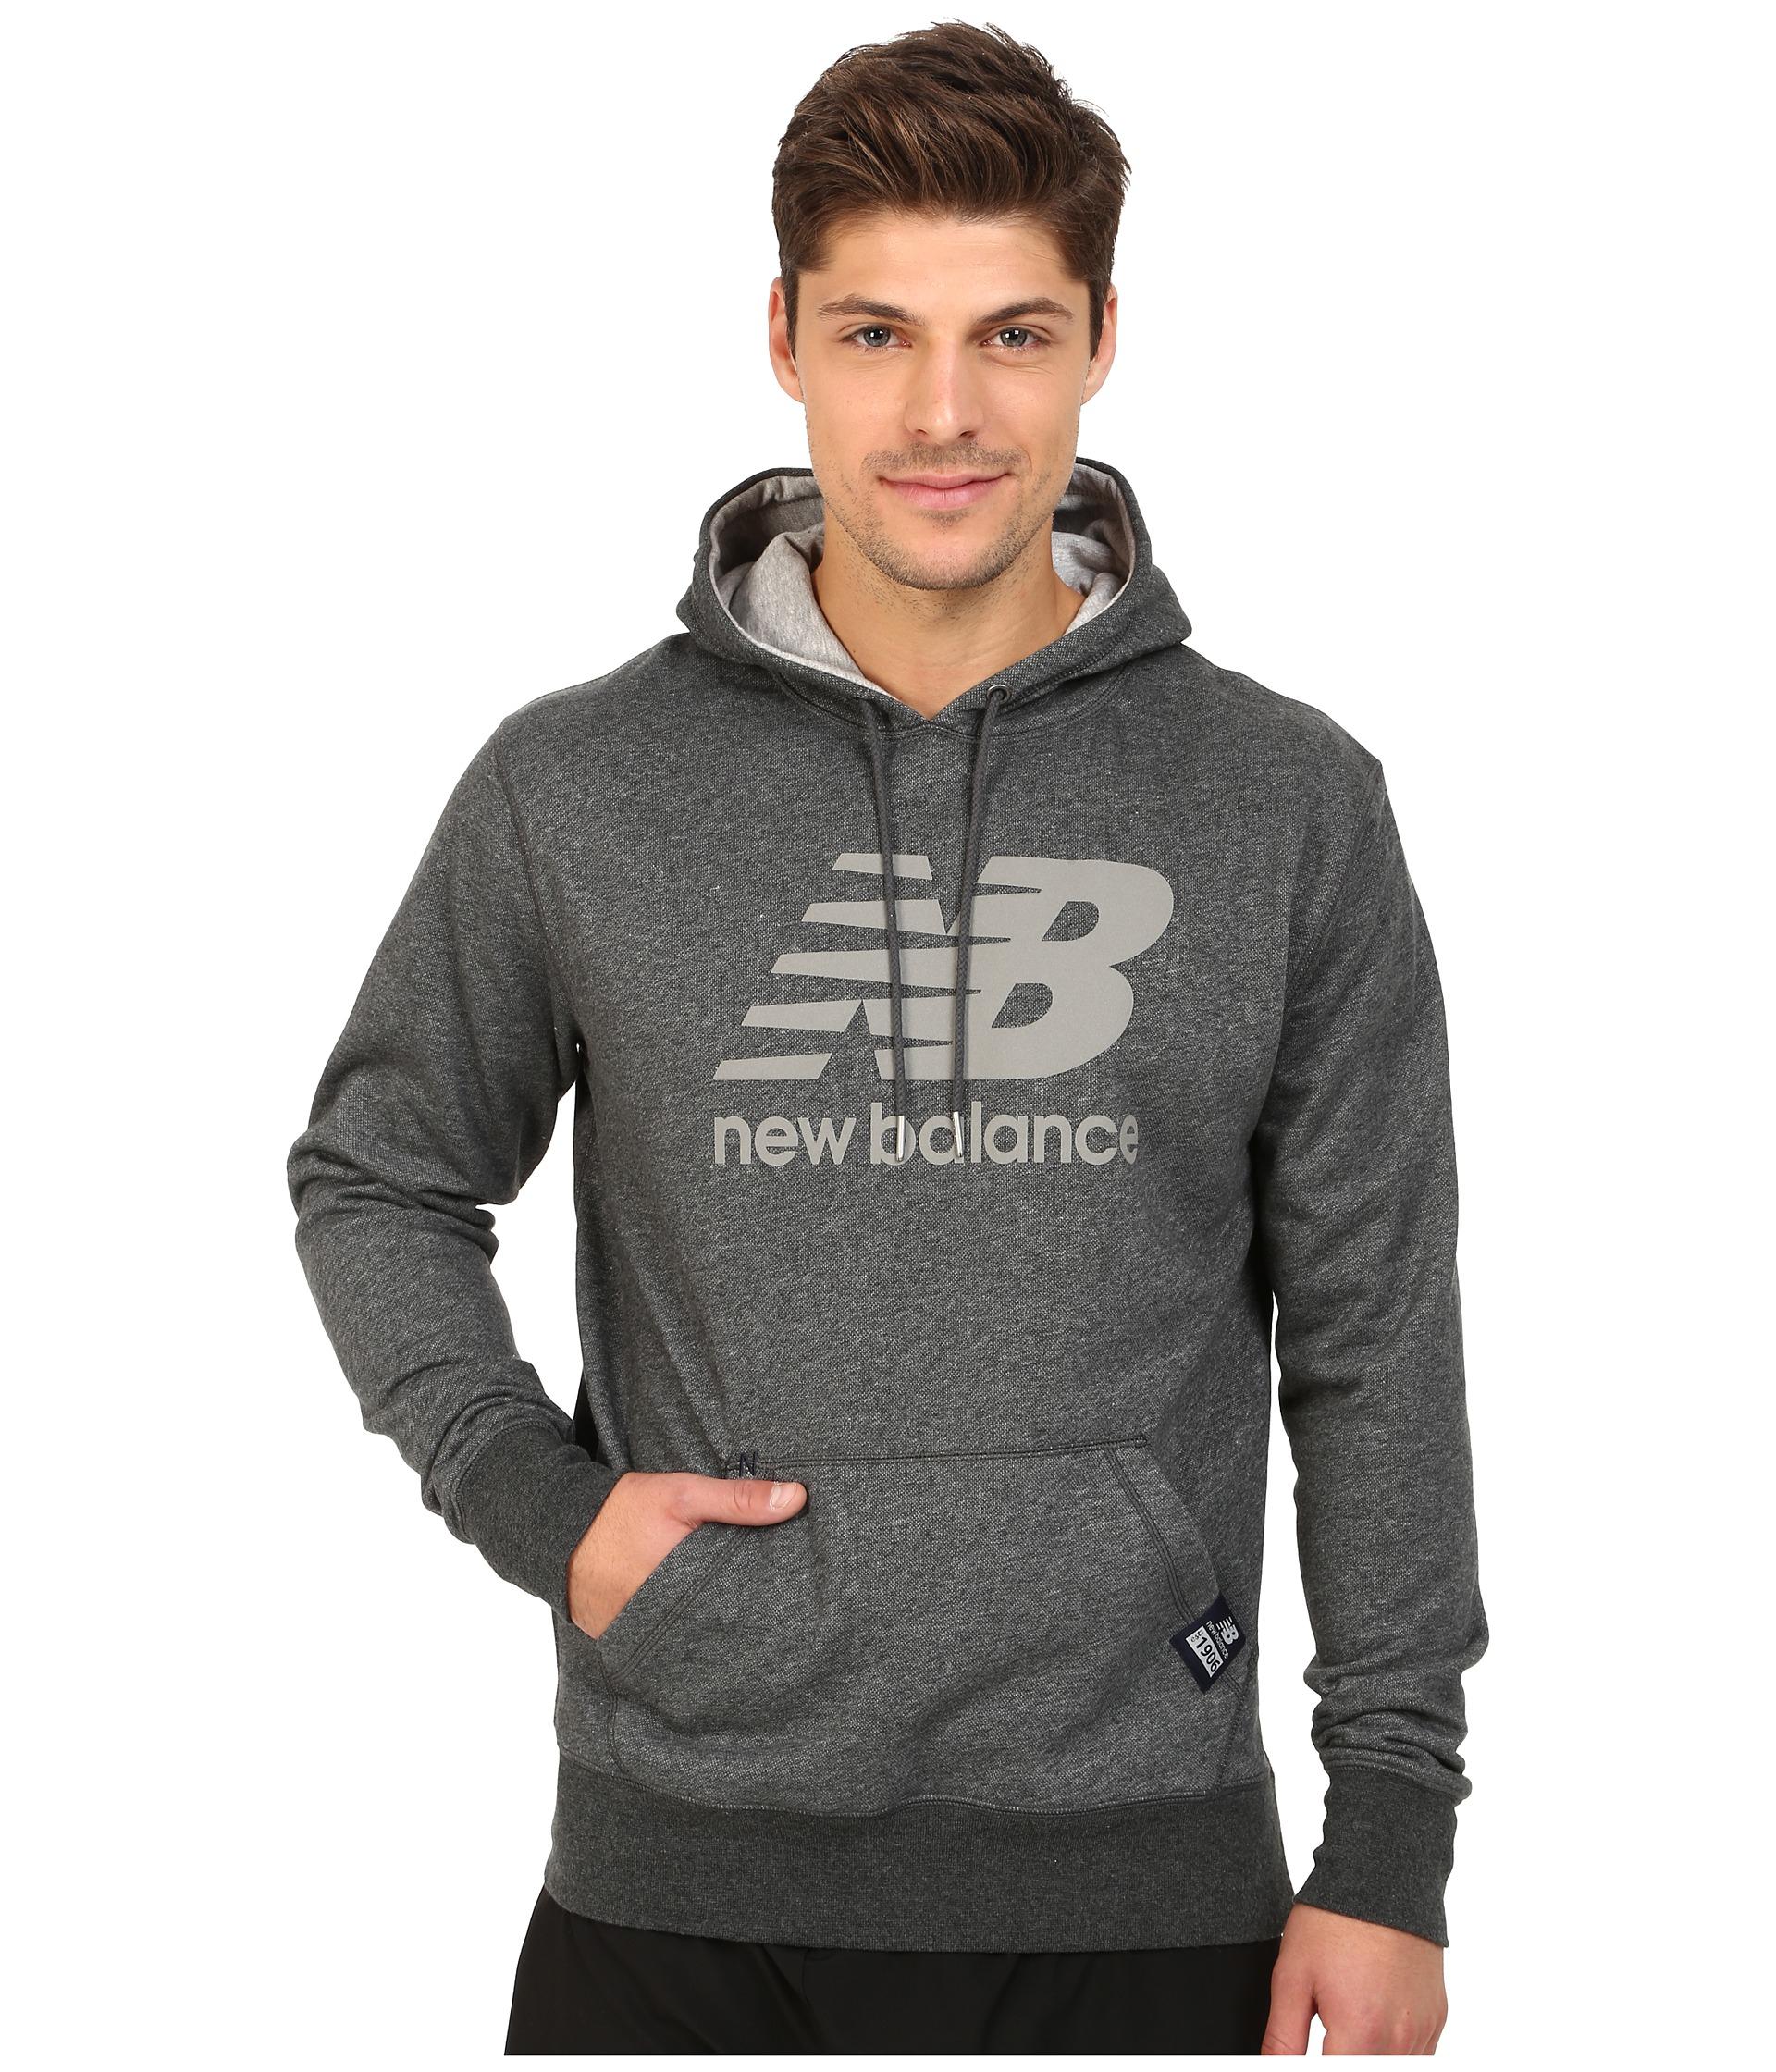 eb4b76ca42 NEW Balance-Essentials NB Logo Hoodie Black con cappuccio Pullover ...